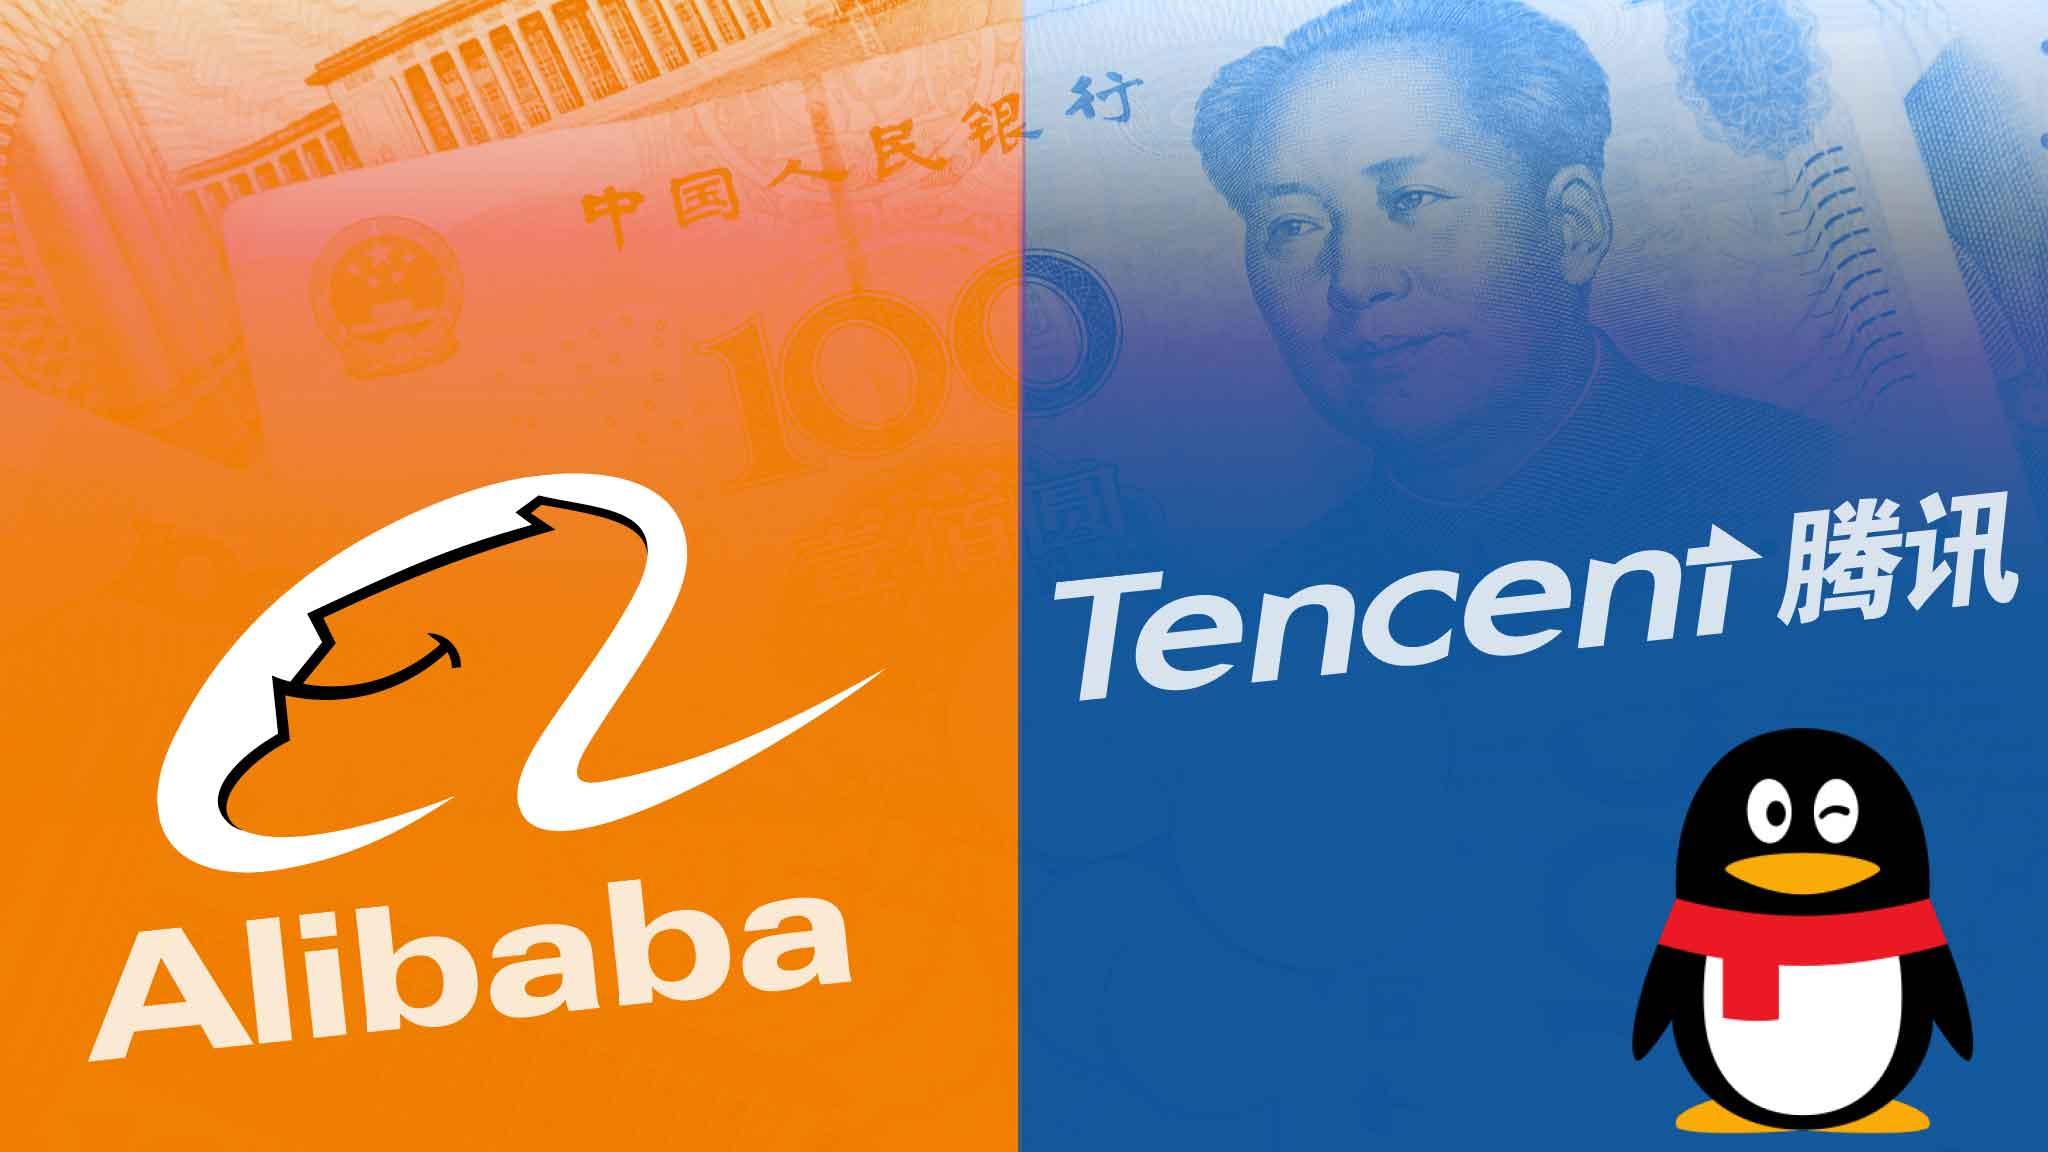 20210708-trung-quoc-phat-alibaba-va-tencent-trong-cac-vu-kien-chong-doc-quyen-1